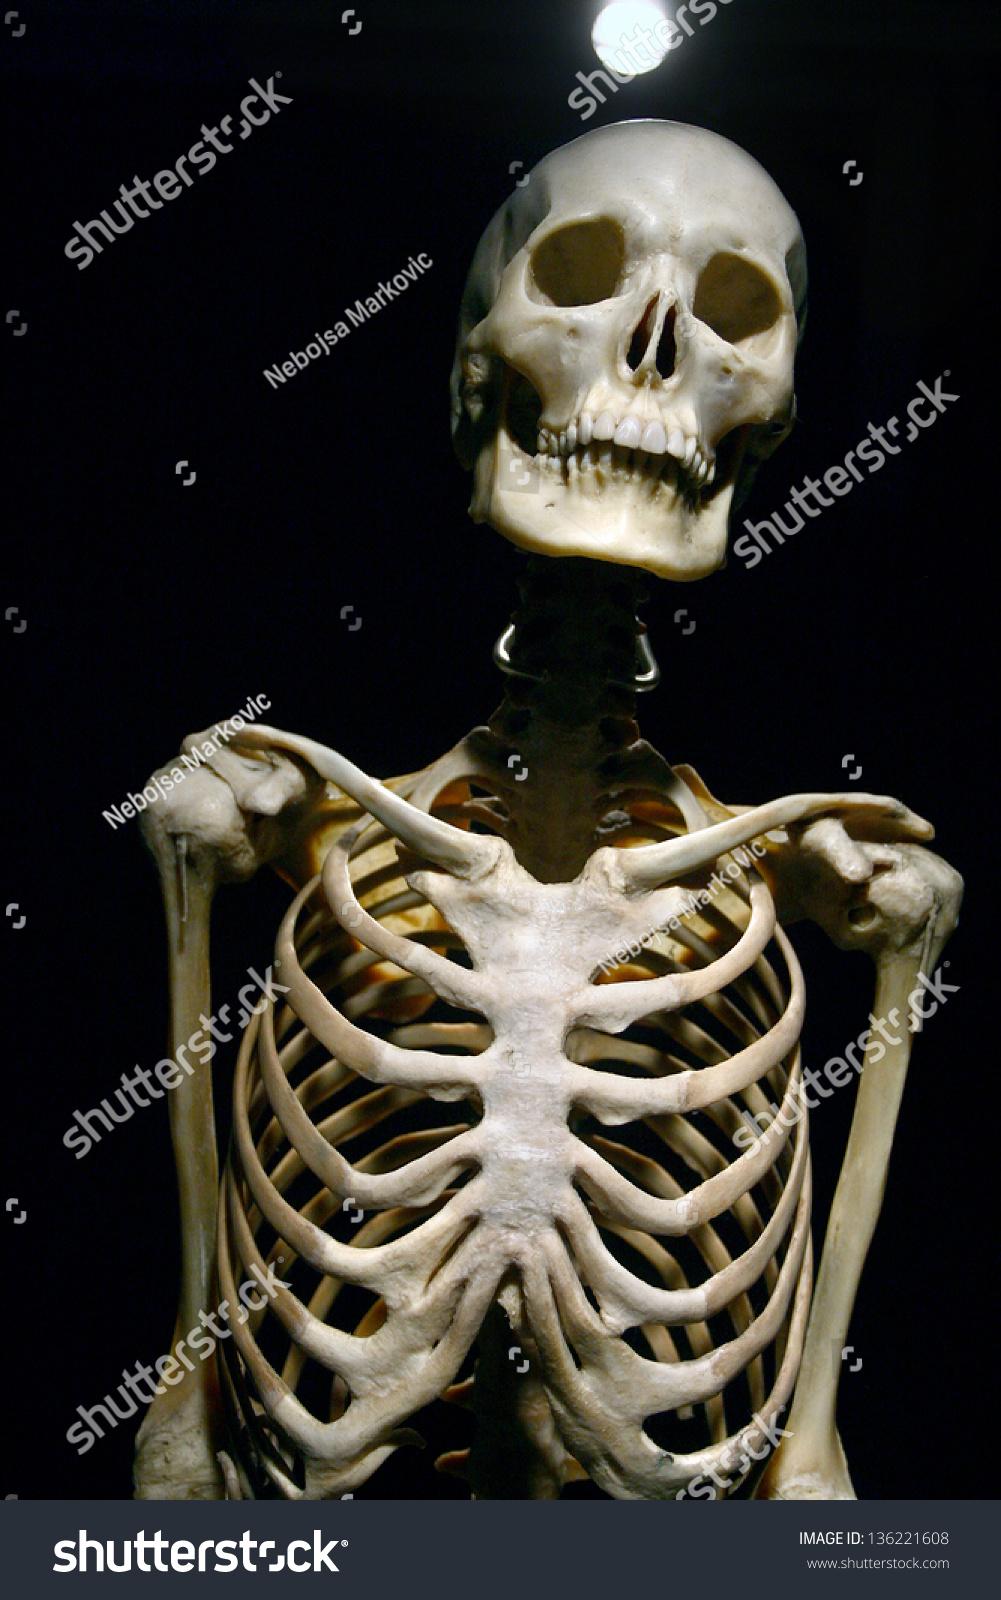 Human Anatomy Real Skeleton On Black Stockfoto Jetzt Bearbeiten